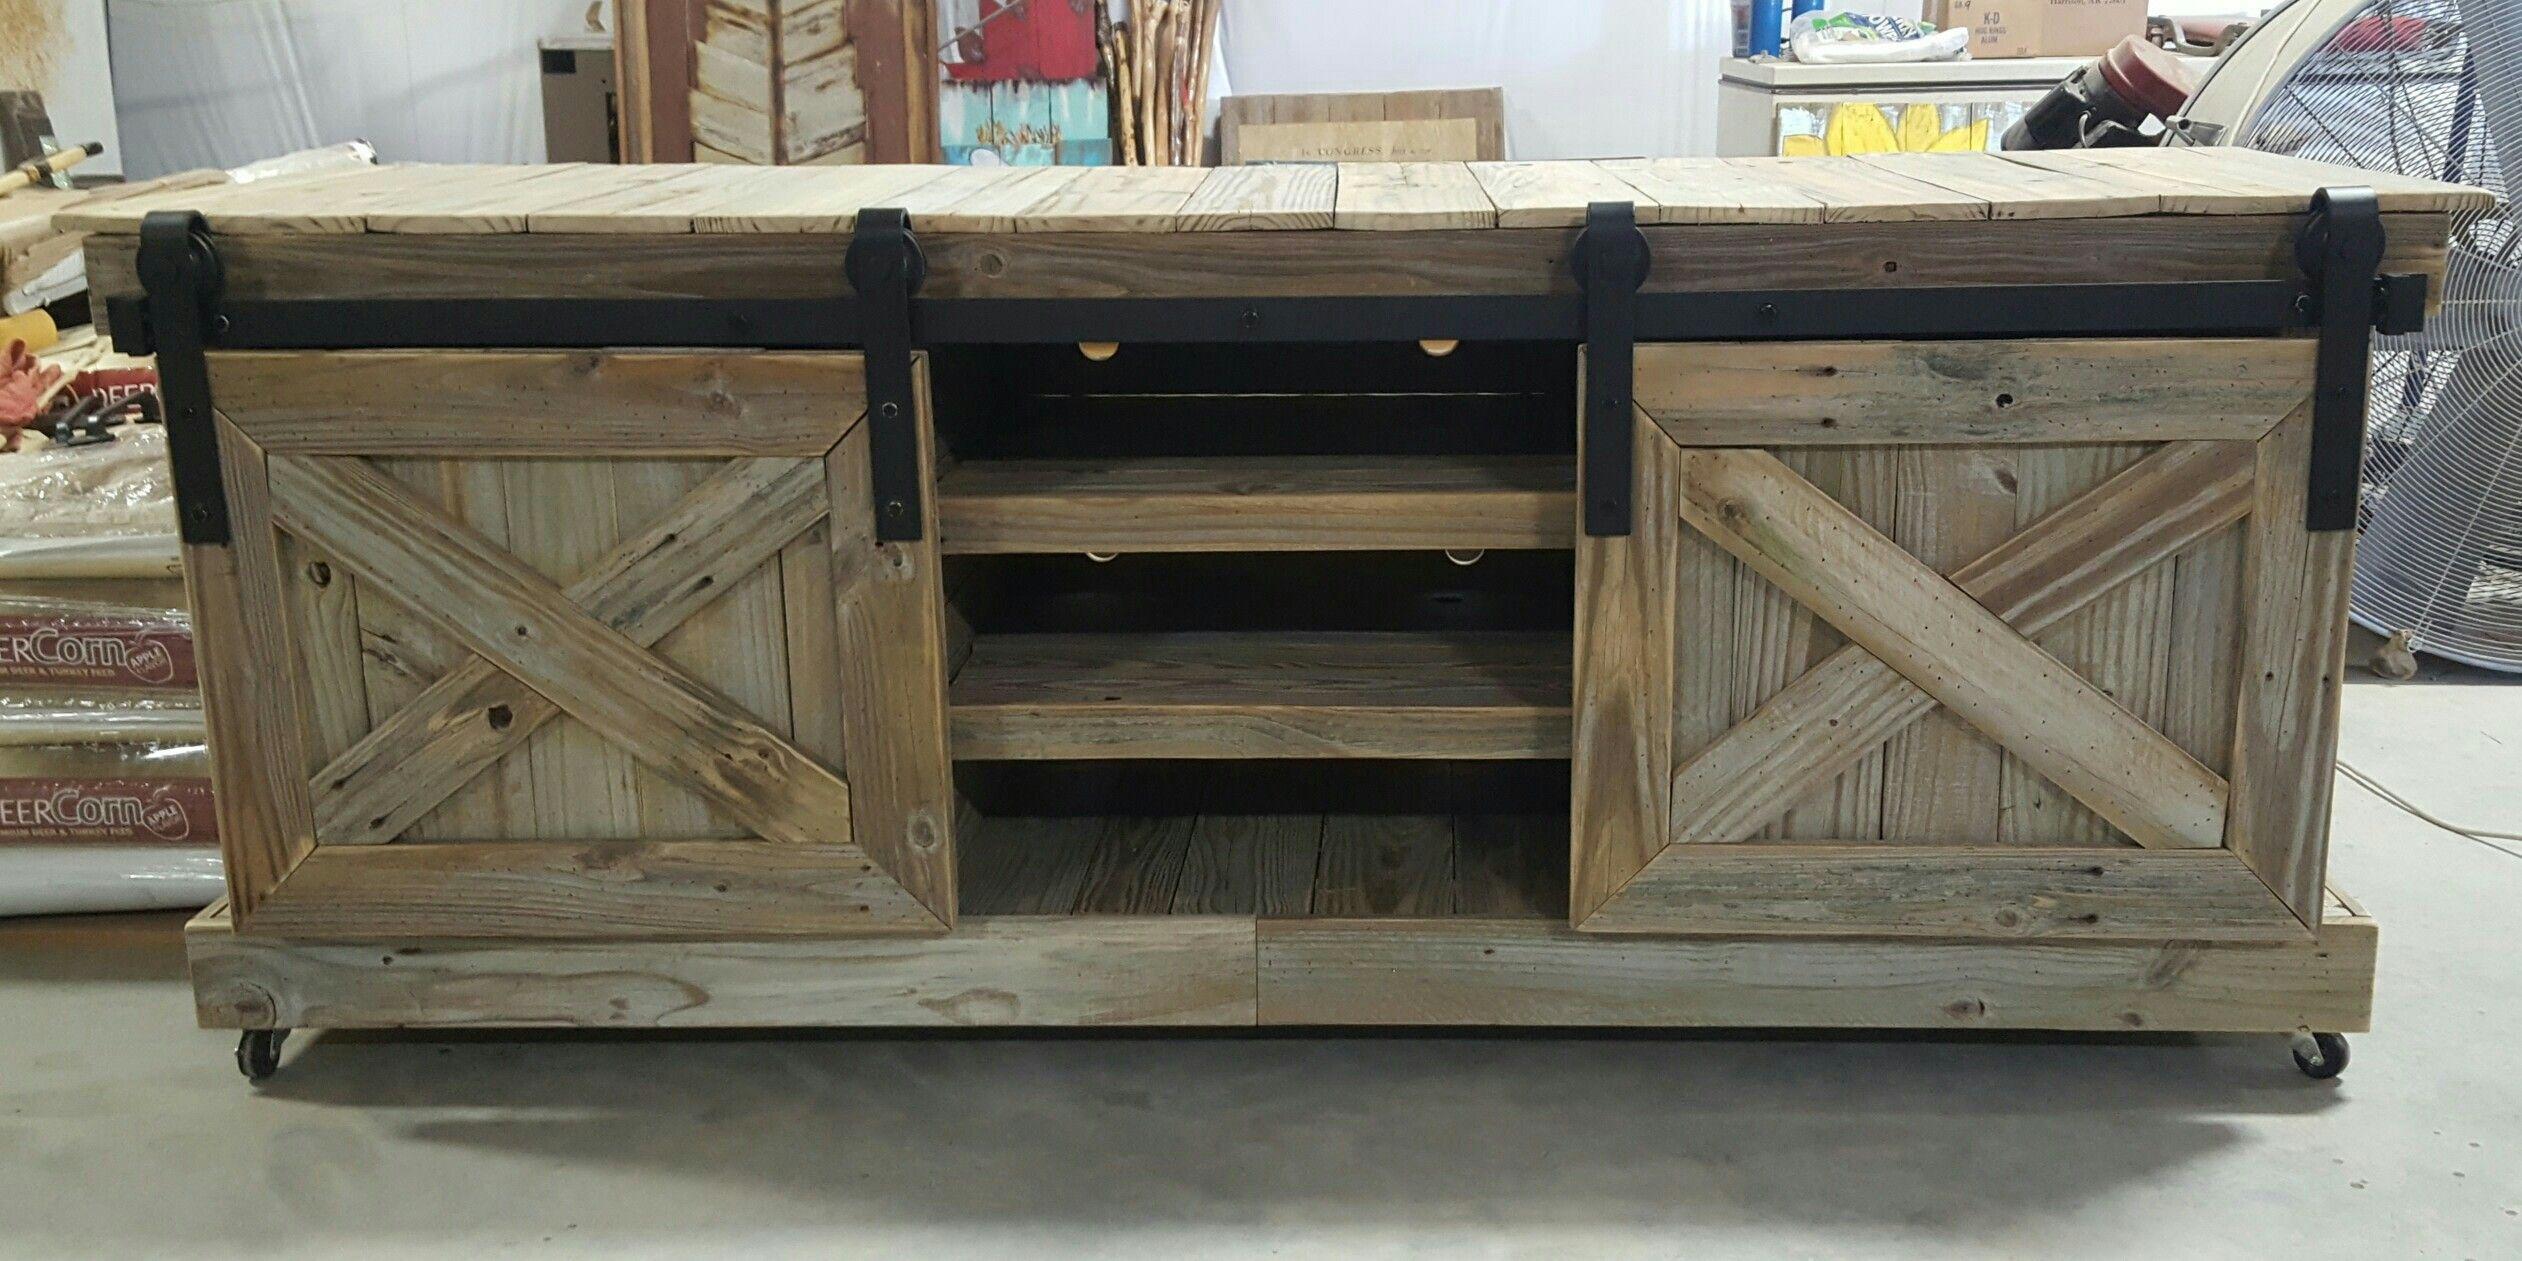 Diy Tv Stand With Barn Doors Using Reclaimed Wood Diy Furniture